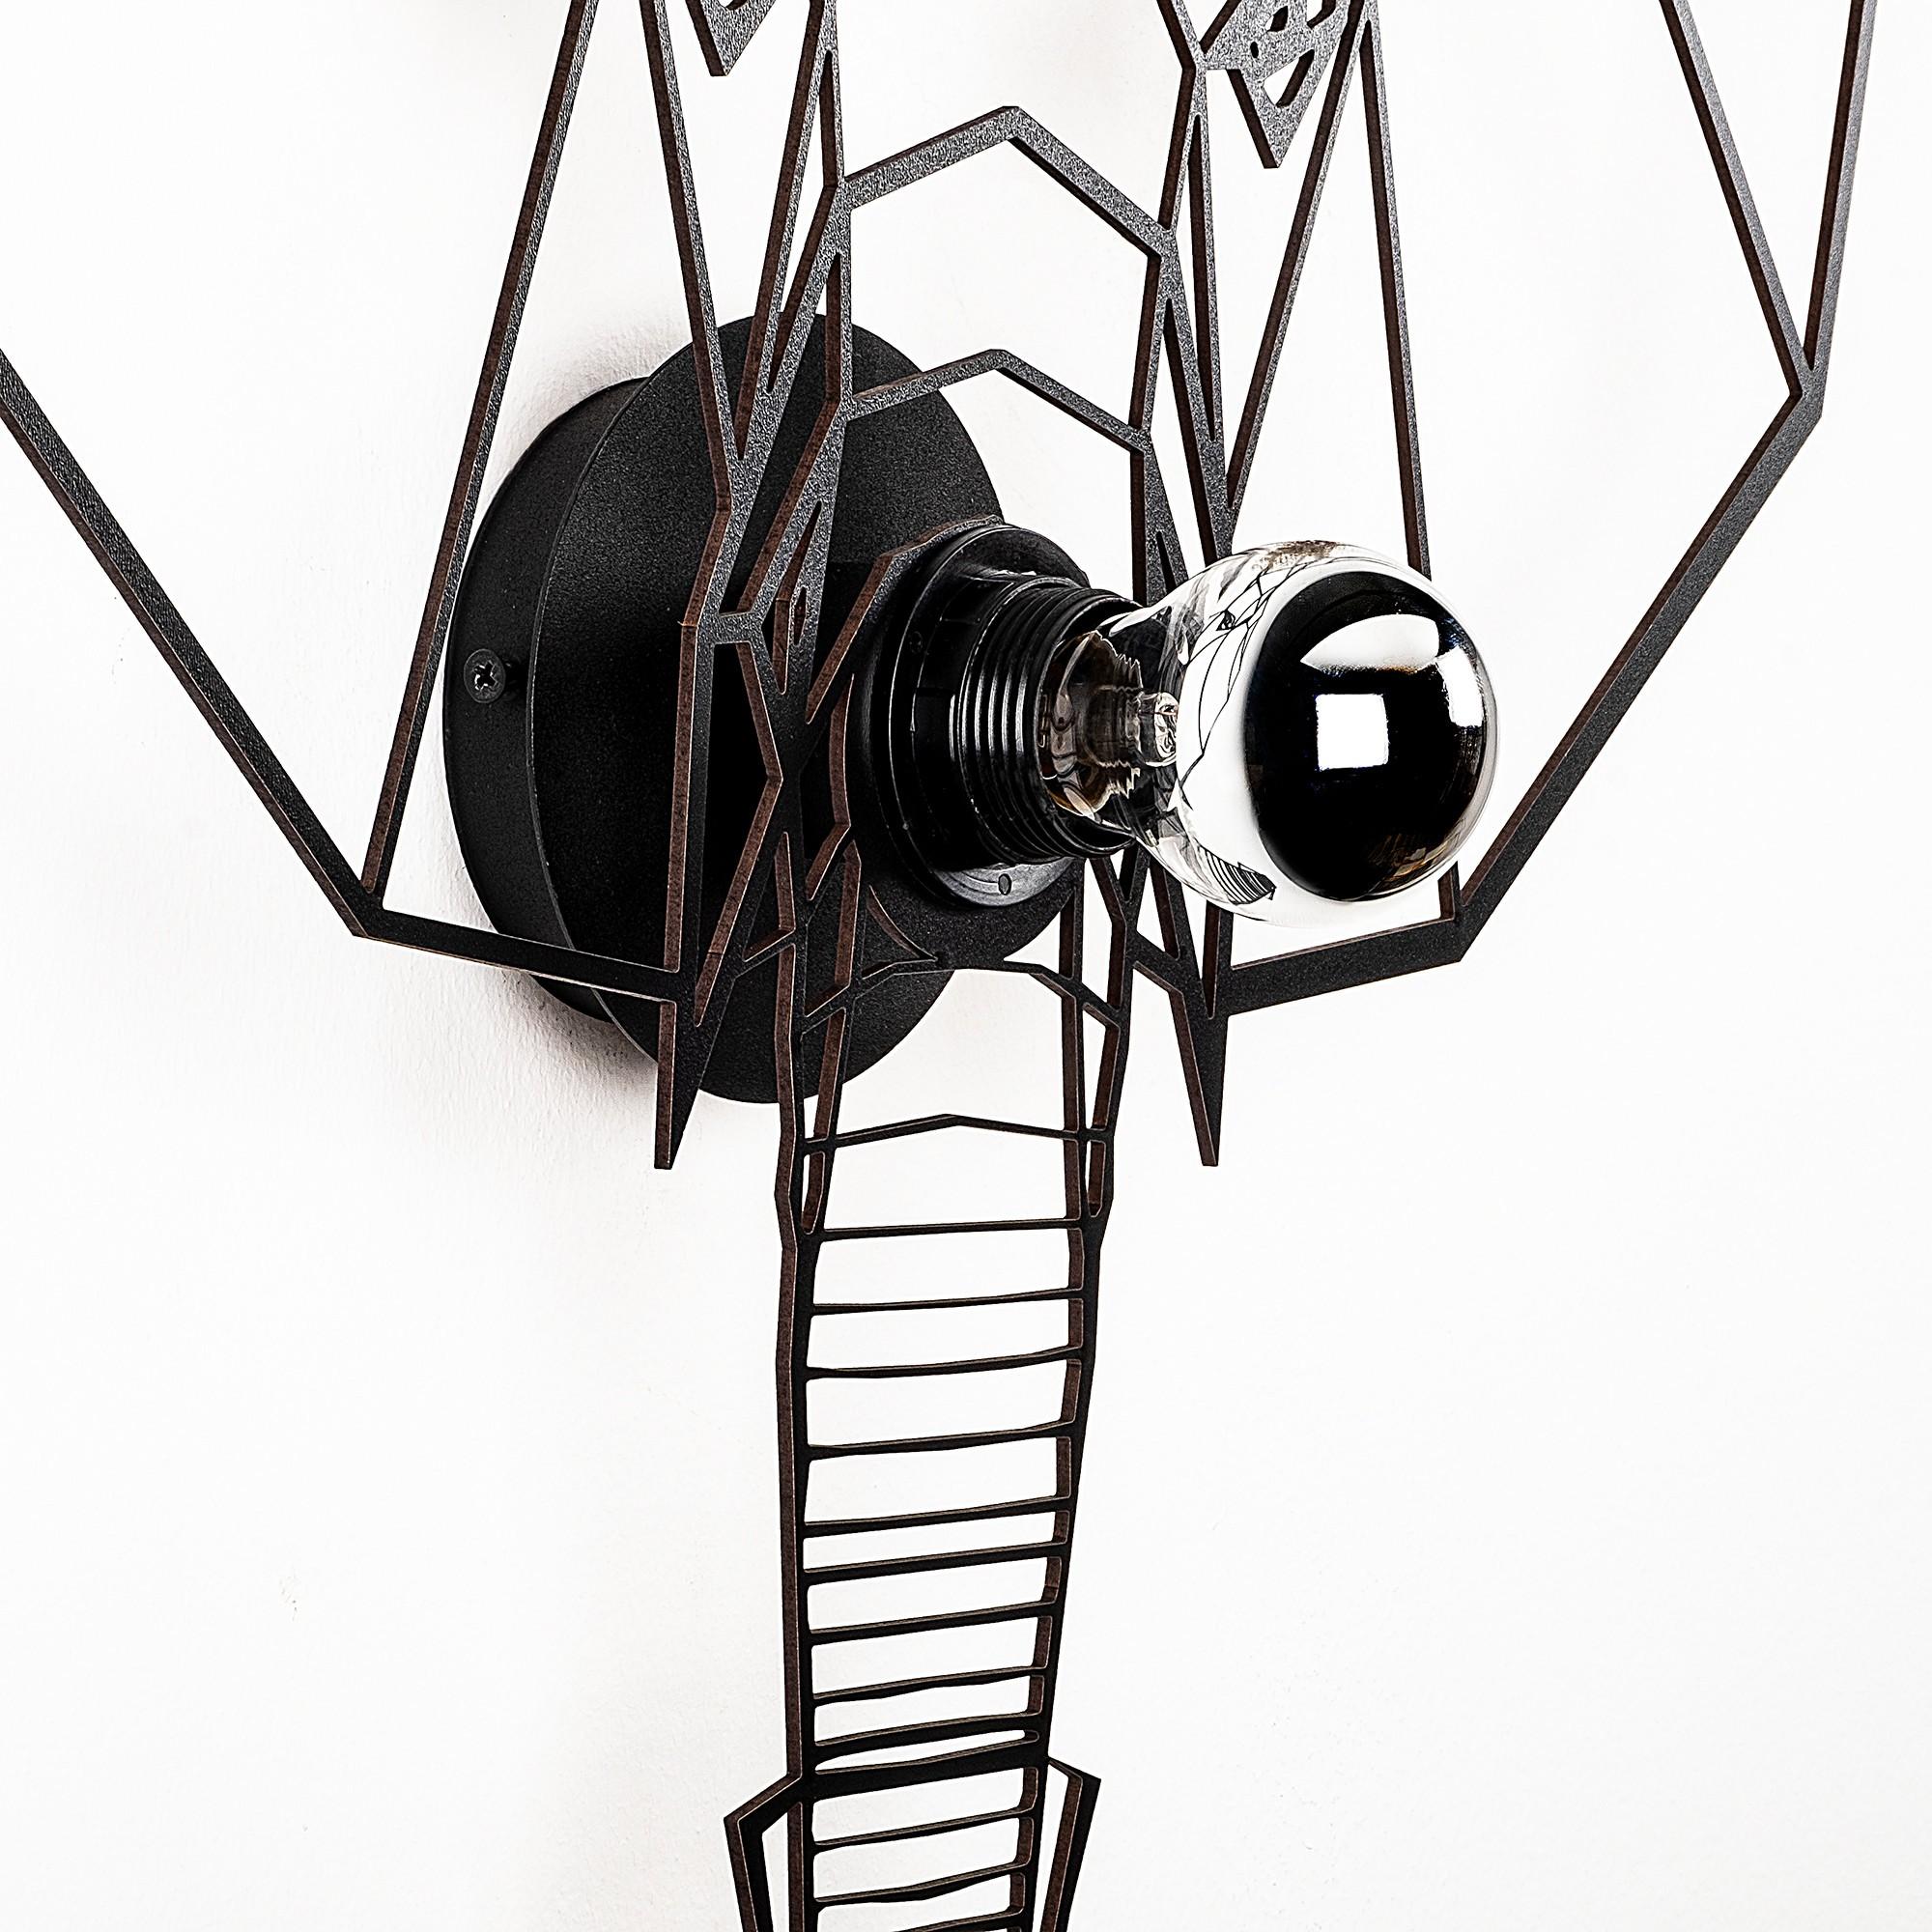 LED industriële wanddeco lamp dieren - Olifant - dimbaar - E27 fitting - zijaanzicht